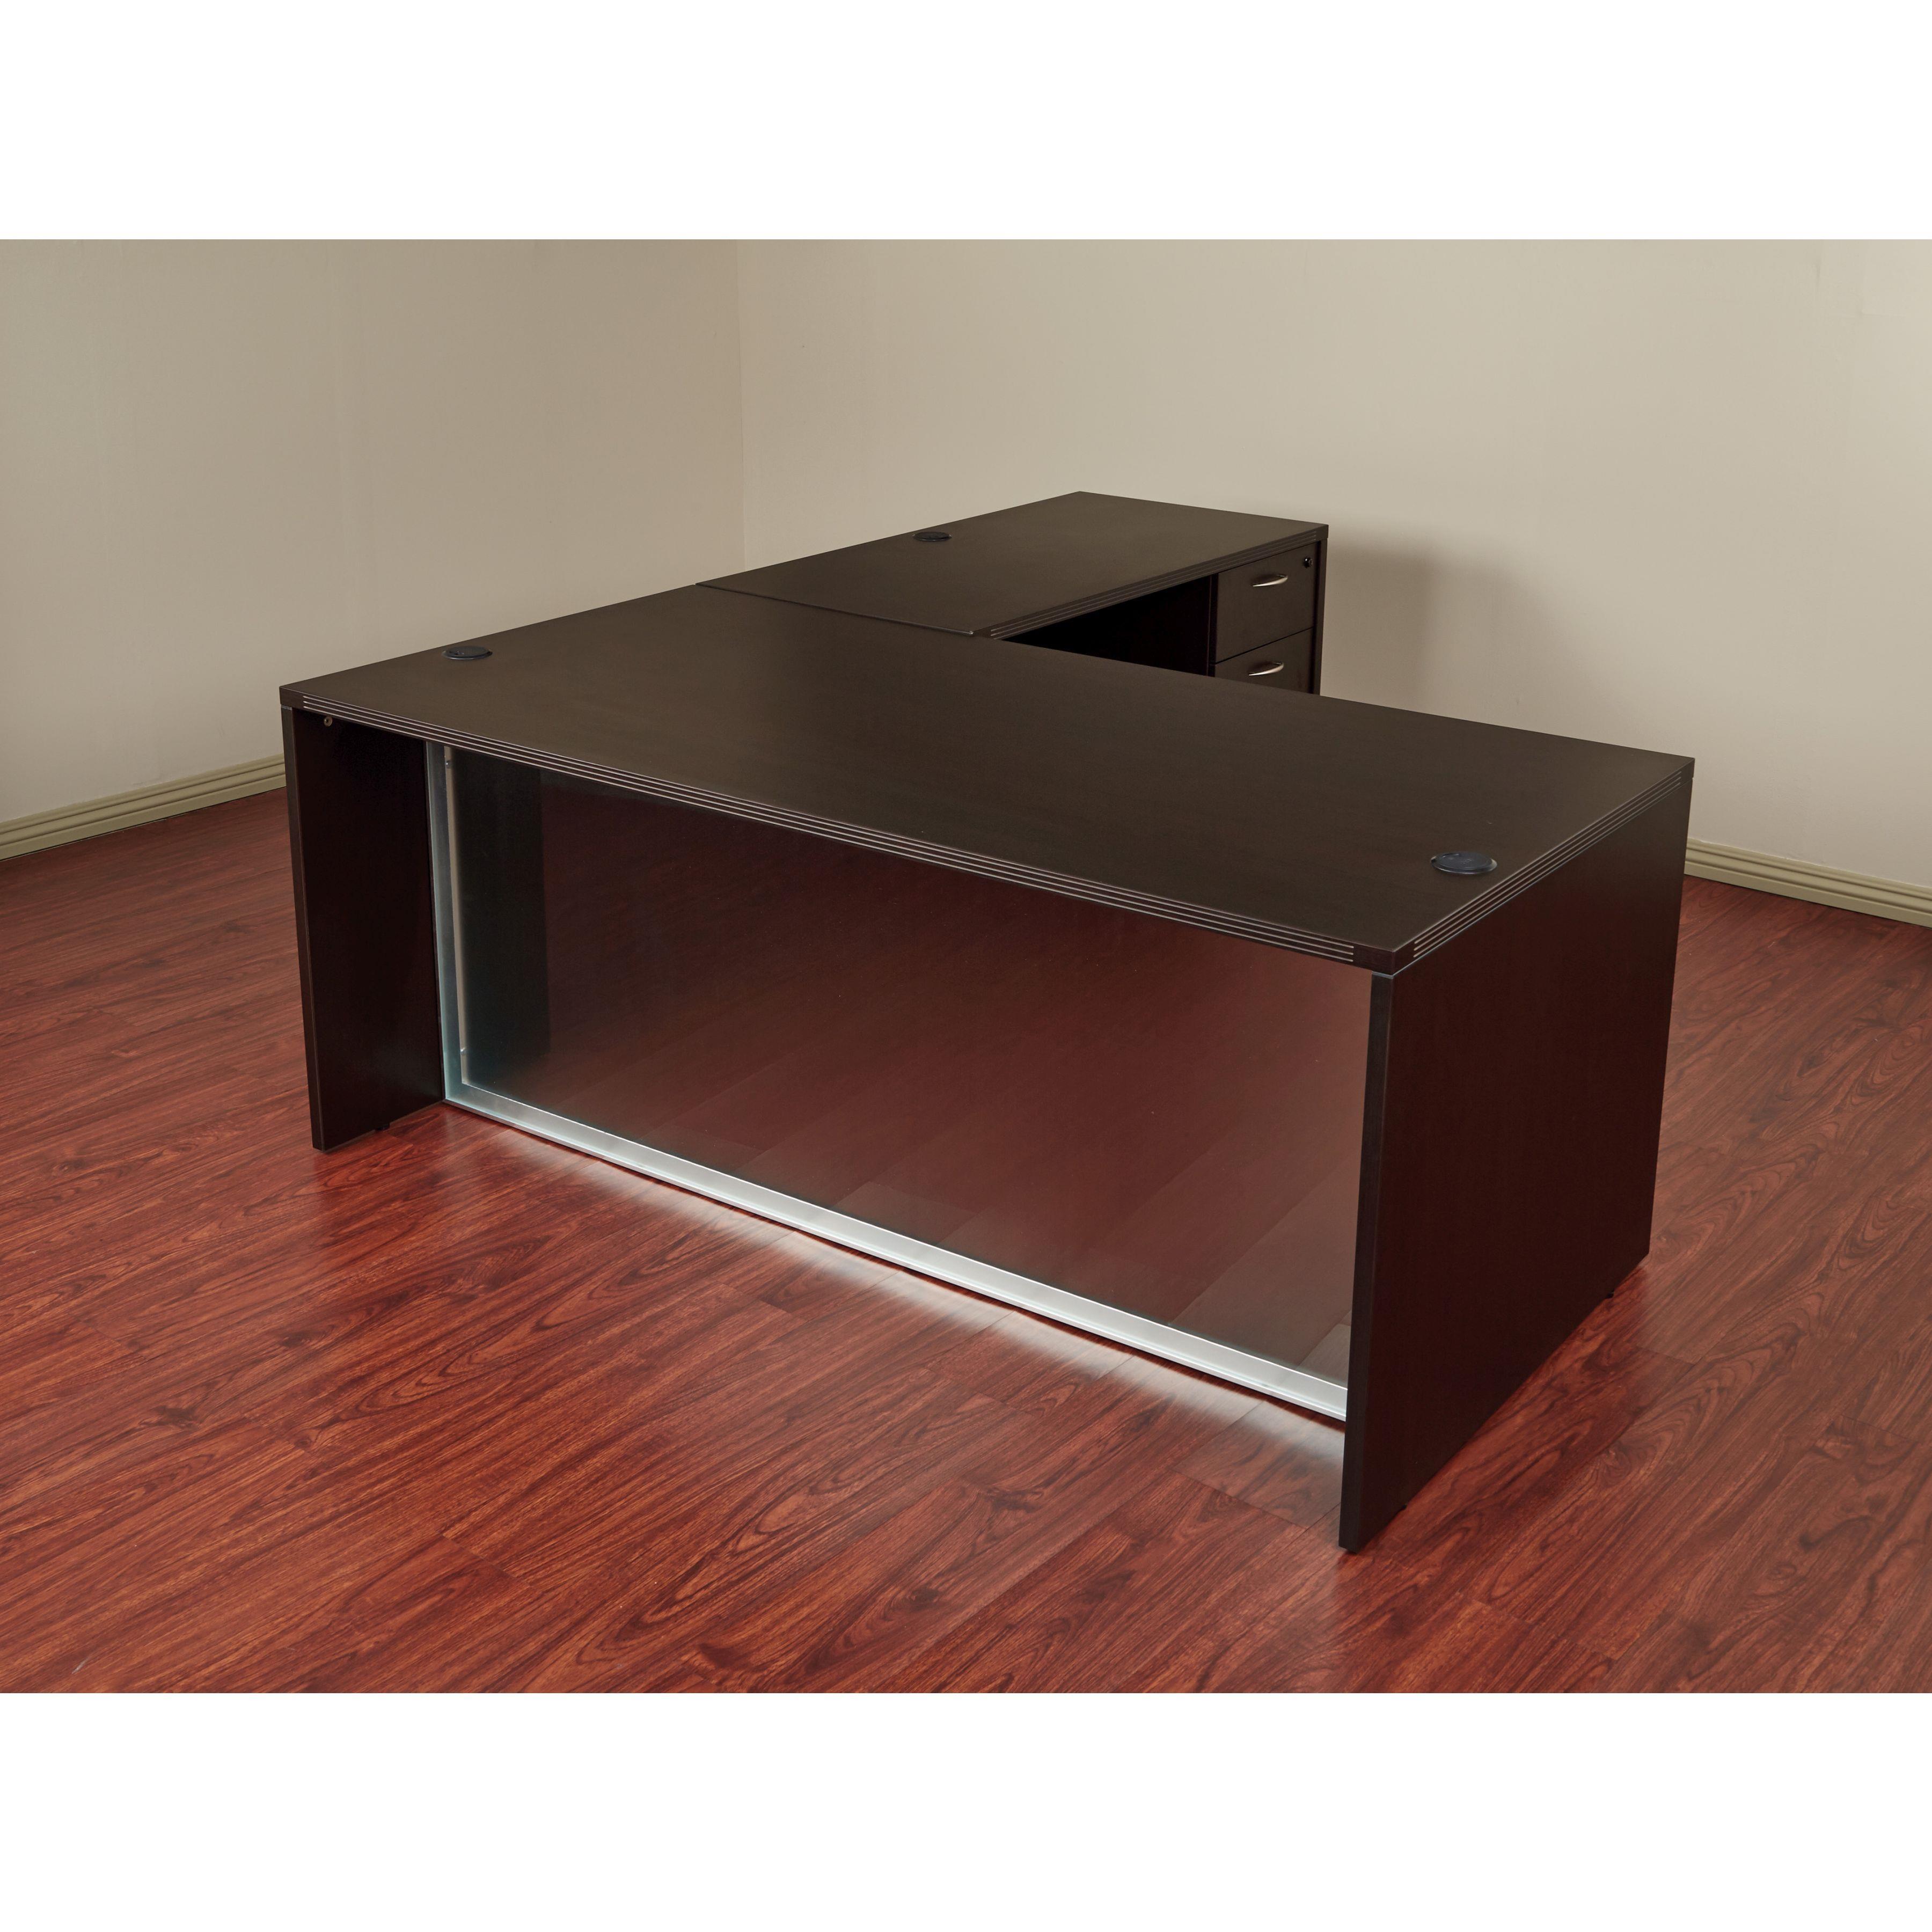 Osp Napa L Shaped Desk With Glass Modesty Panel